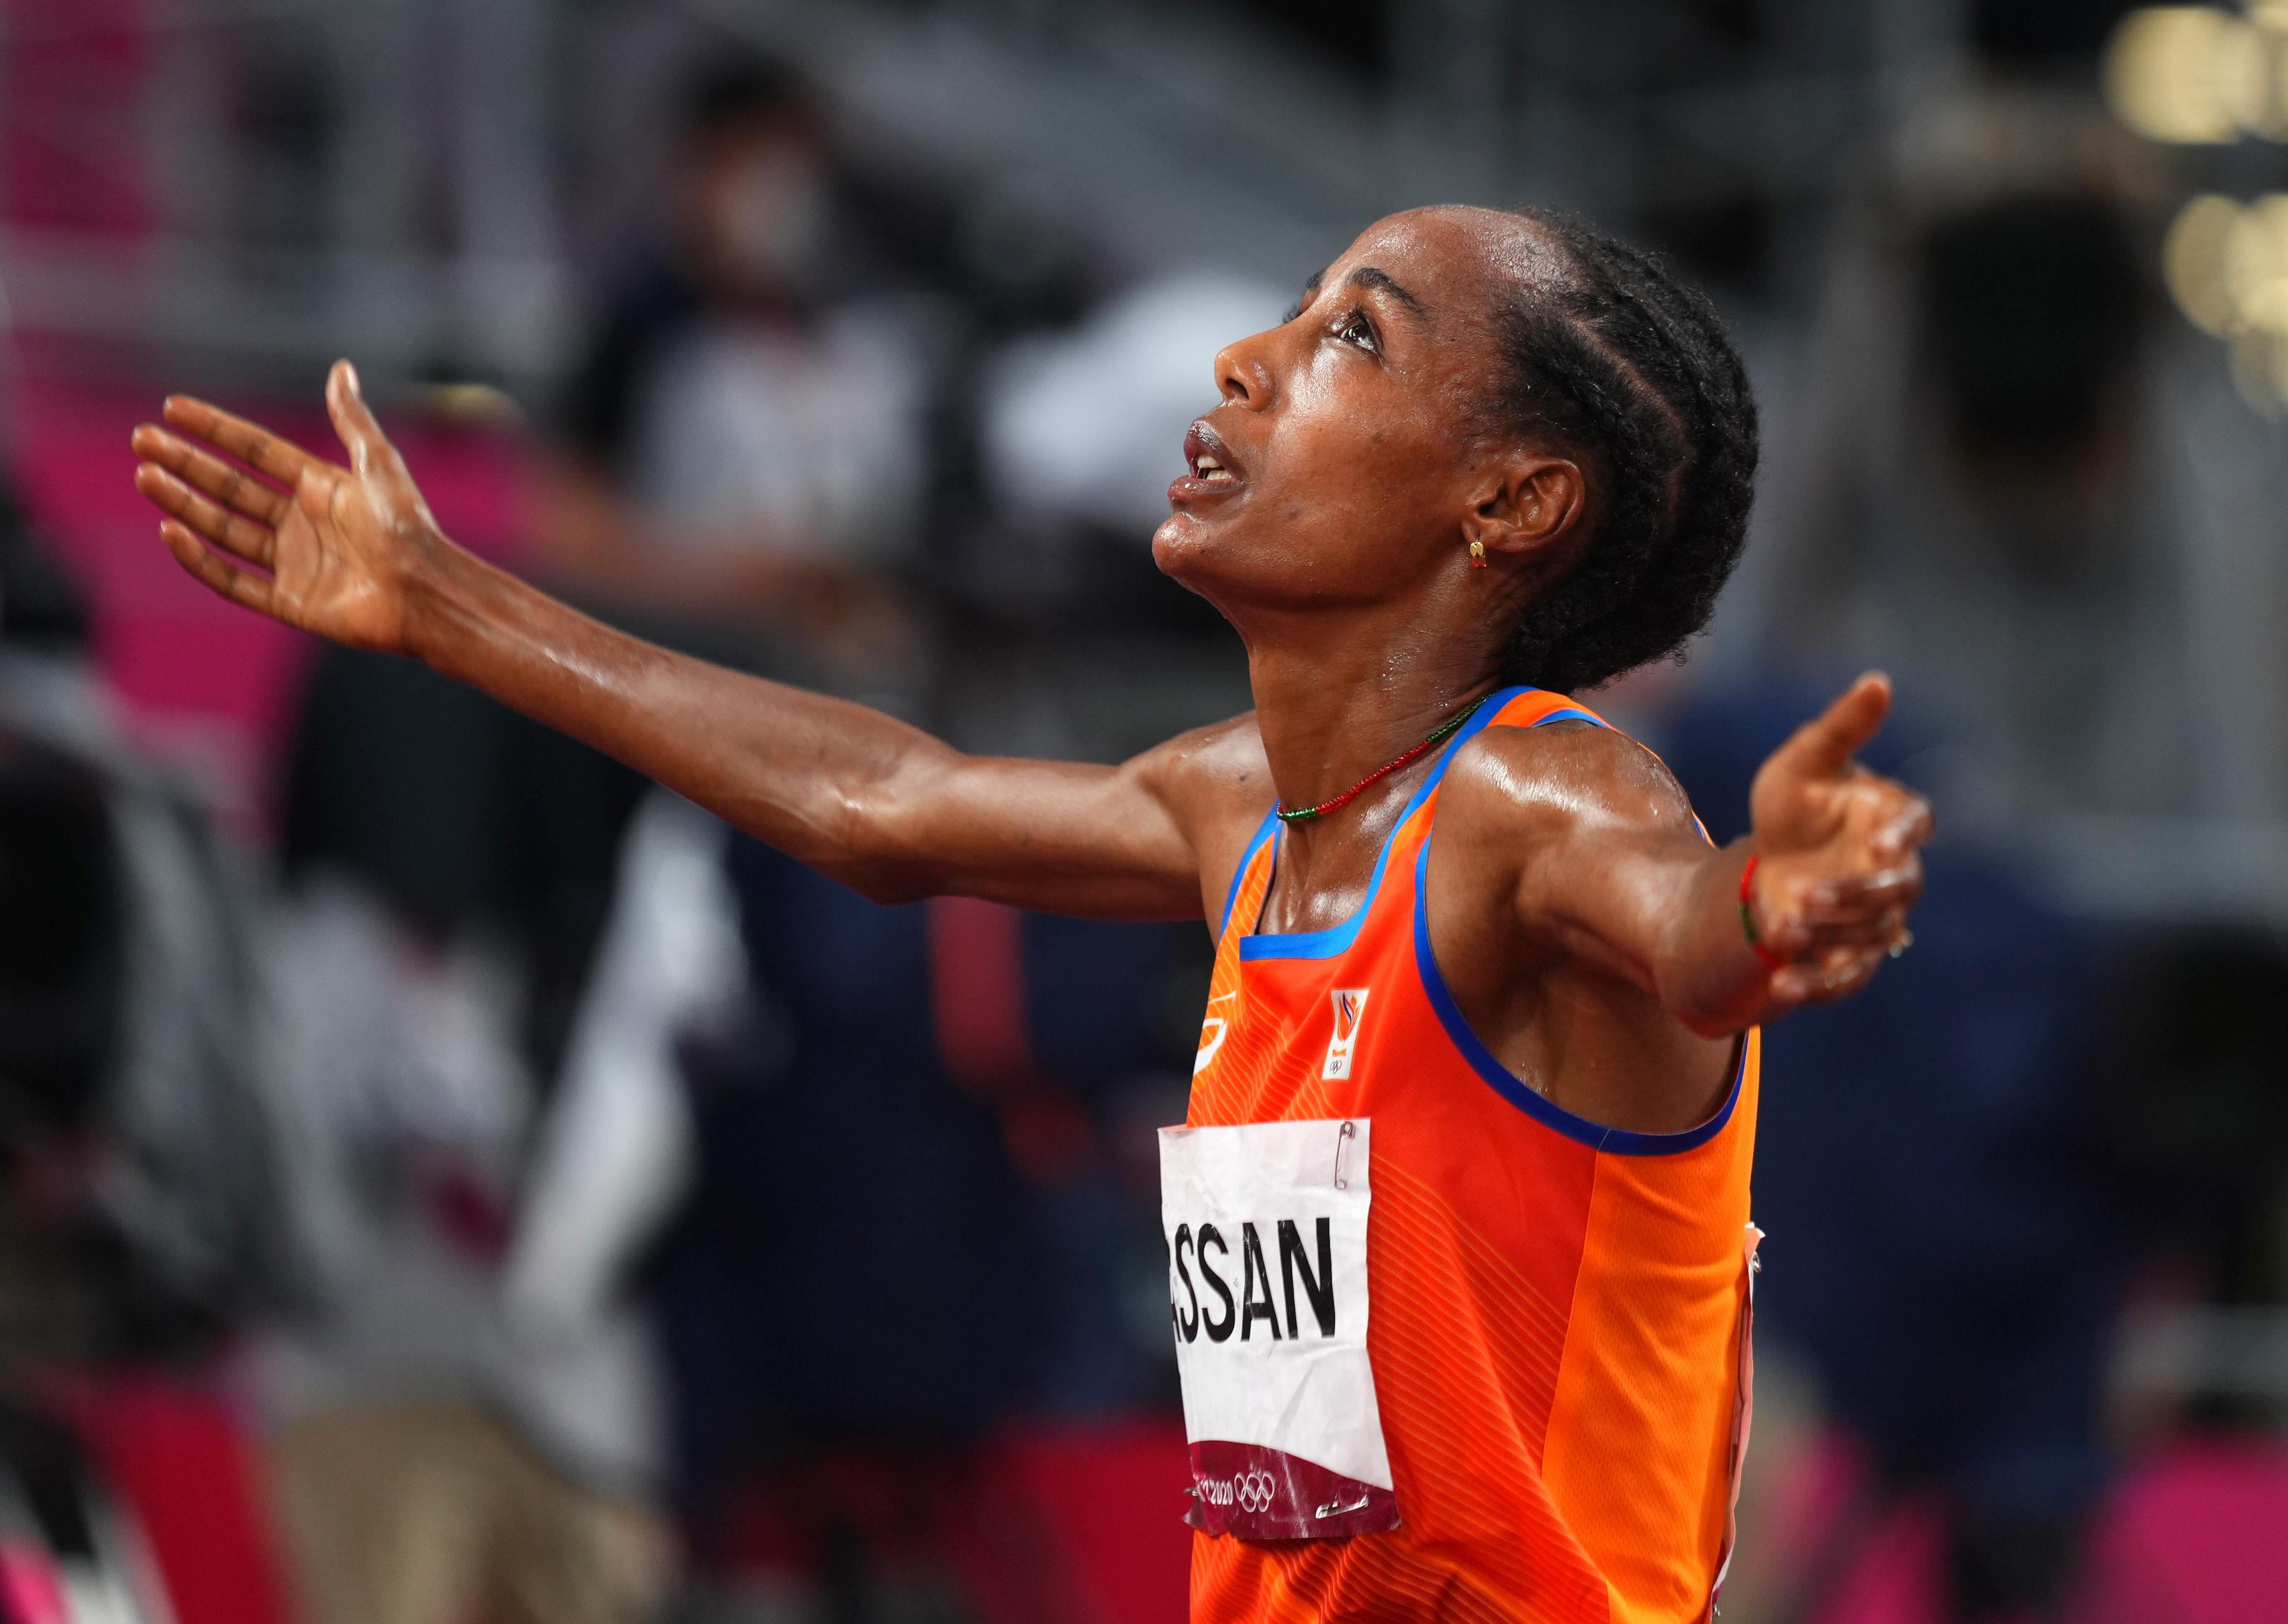 Tokyo 2020 Olympics - Athletics - Women's 5000m - Final - Olympic Stadium, Tokyo, Japan - August 2, 2021. Sifan Hassan of the Netherlands celebrates winning the gold medal REUTERS/Aleksandra Szmigiel